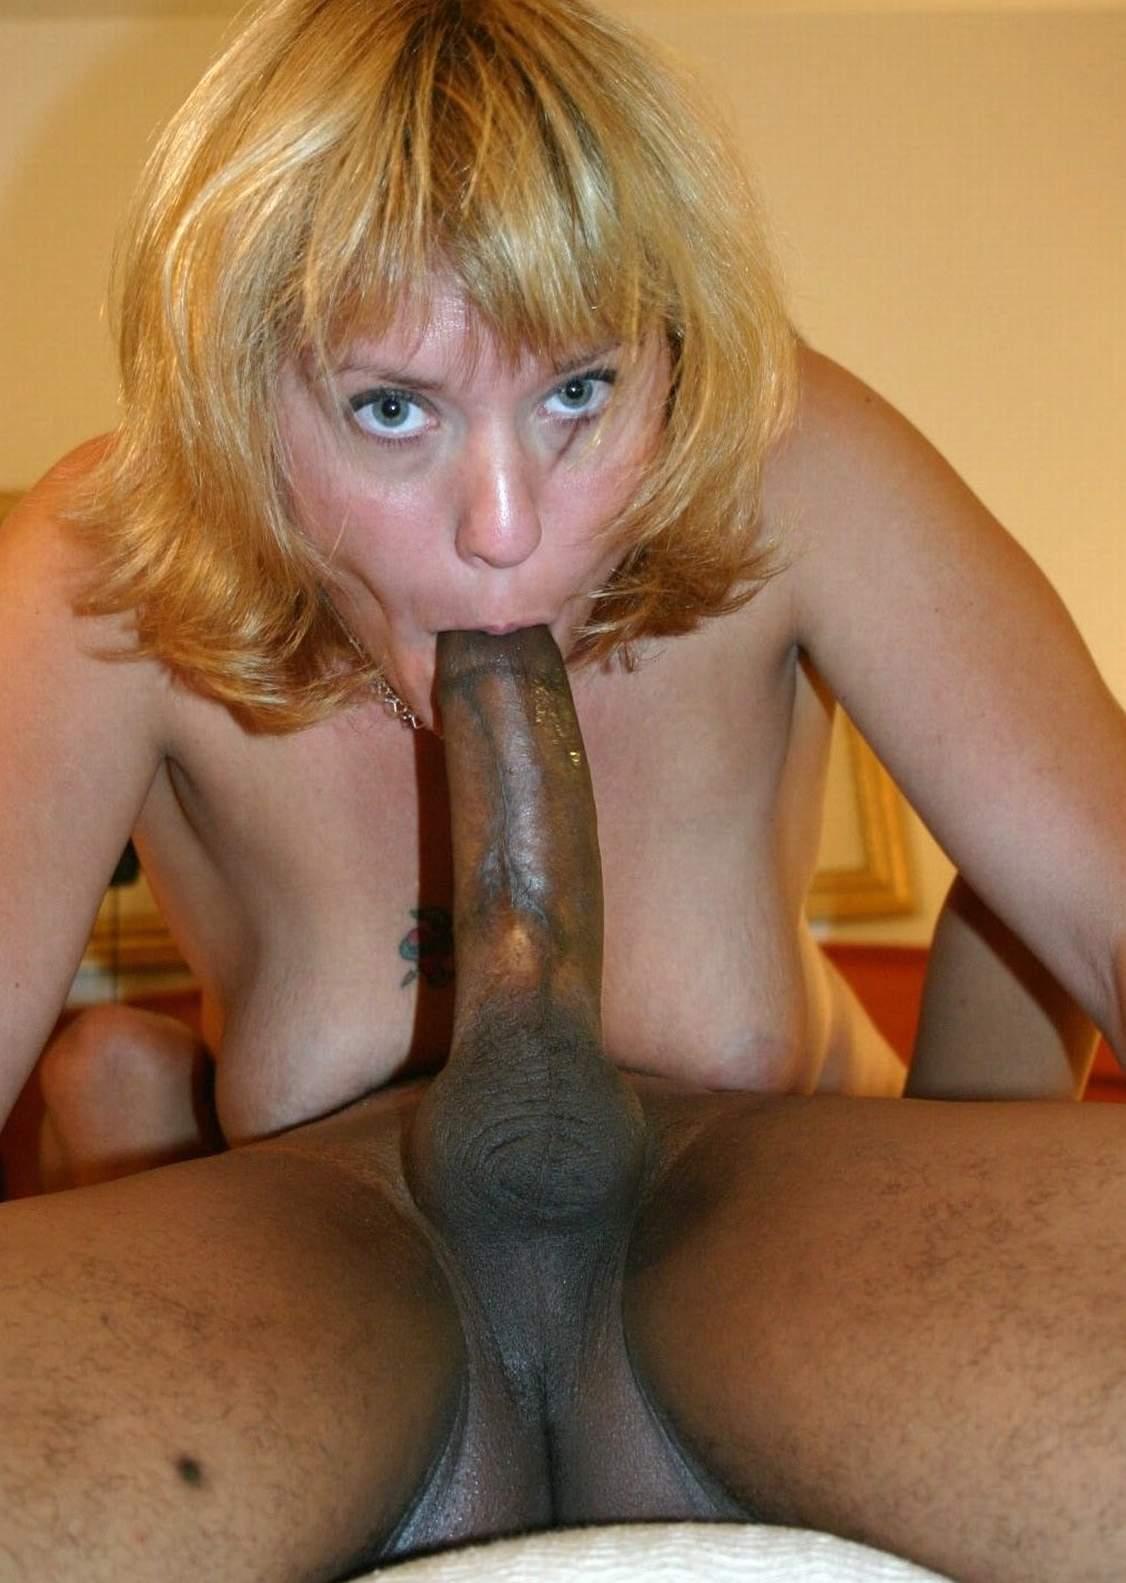 Hot anal sex videos